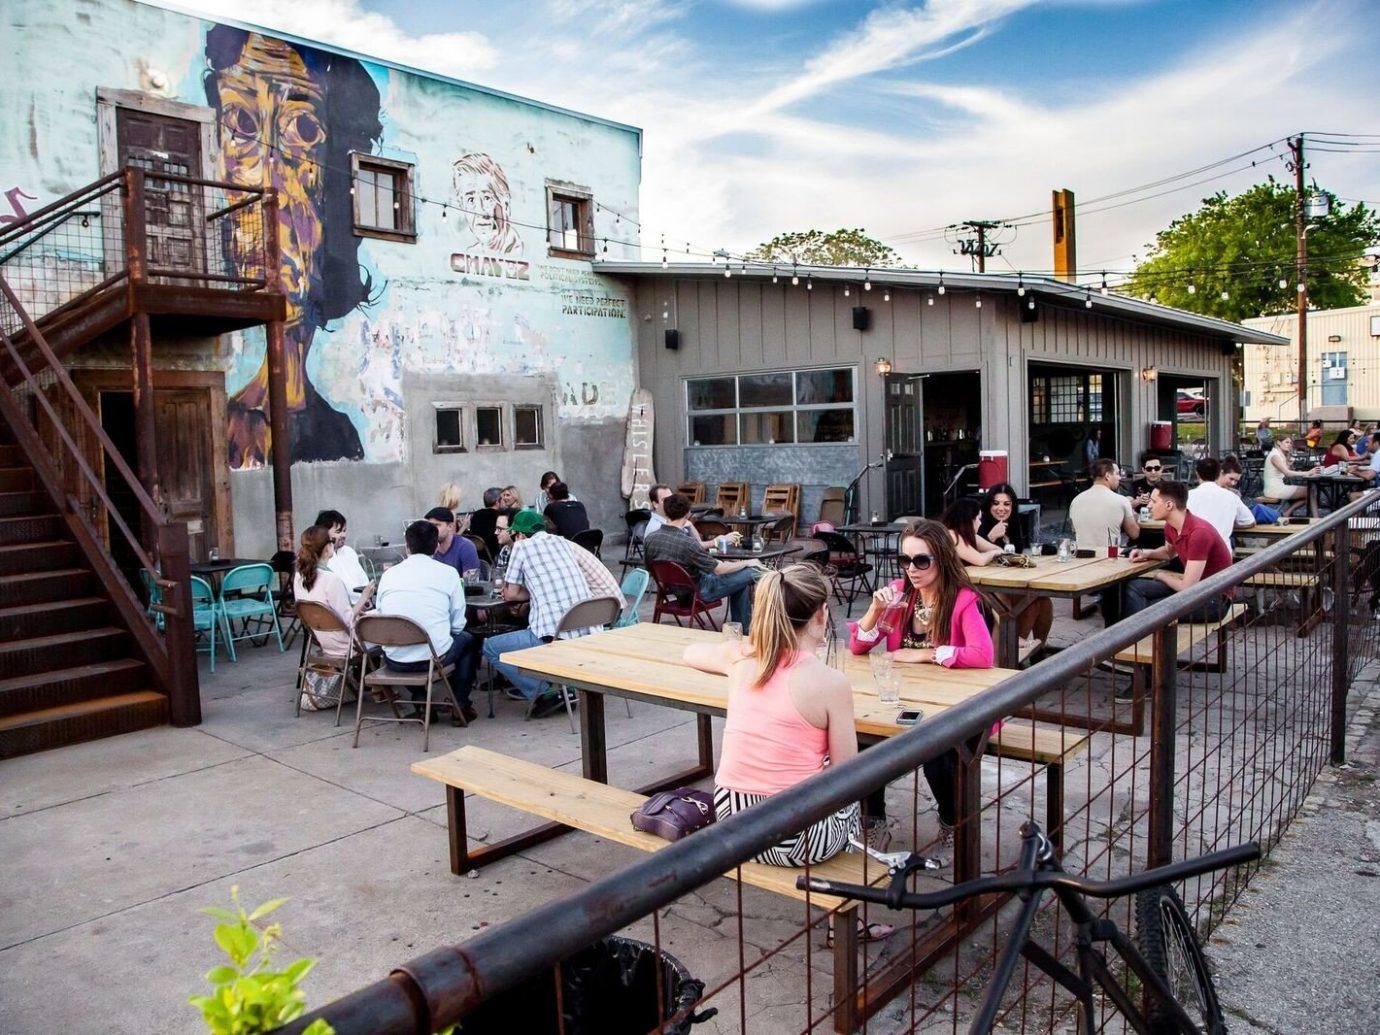 Trip Ideas building sky outdoor Town neighbourhood urban area tourism restaurant Village